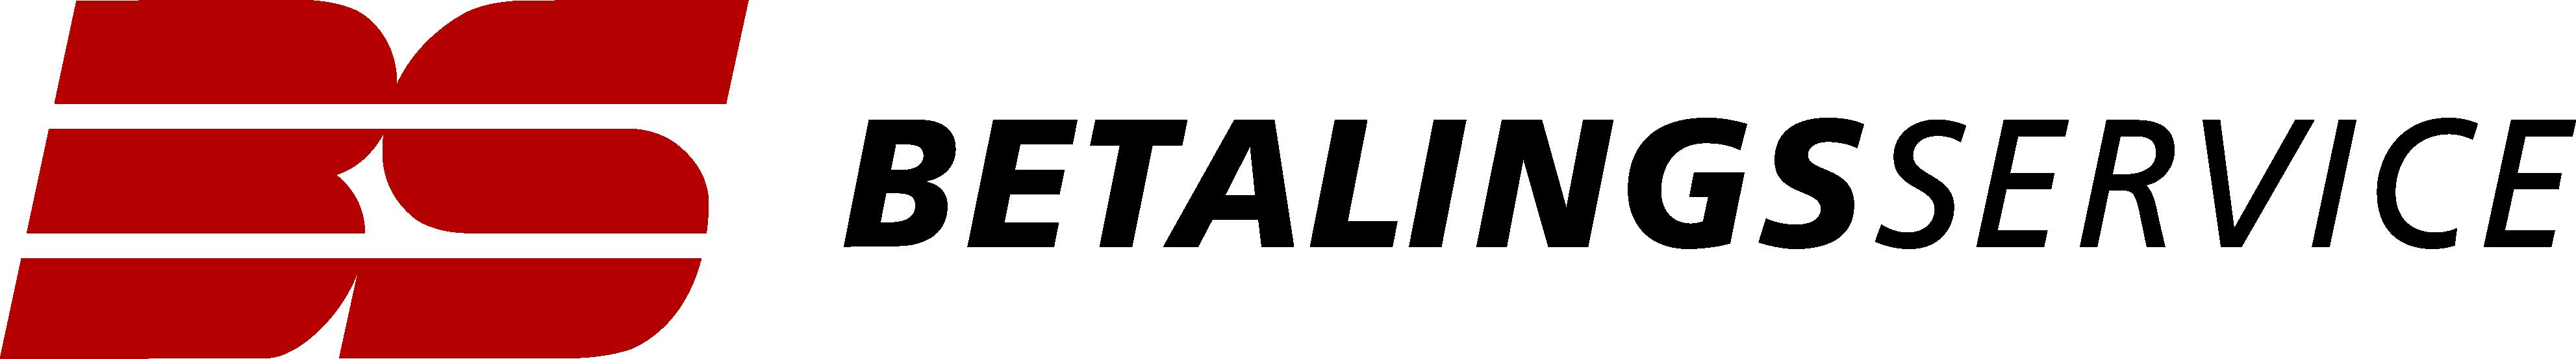 betalingsservice_pos_RGB